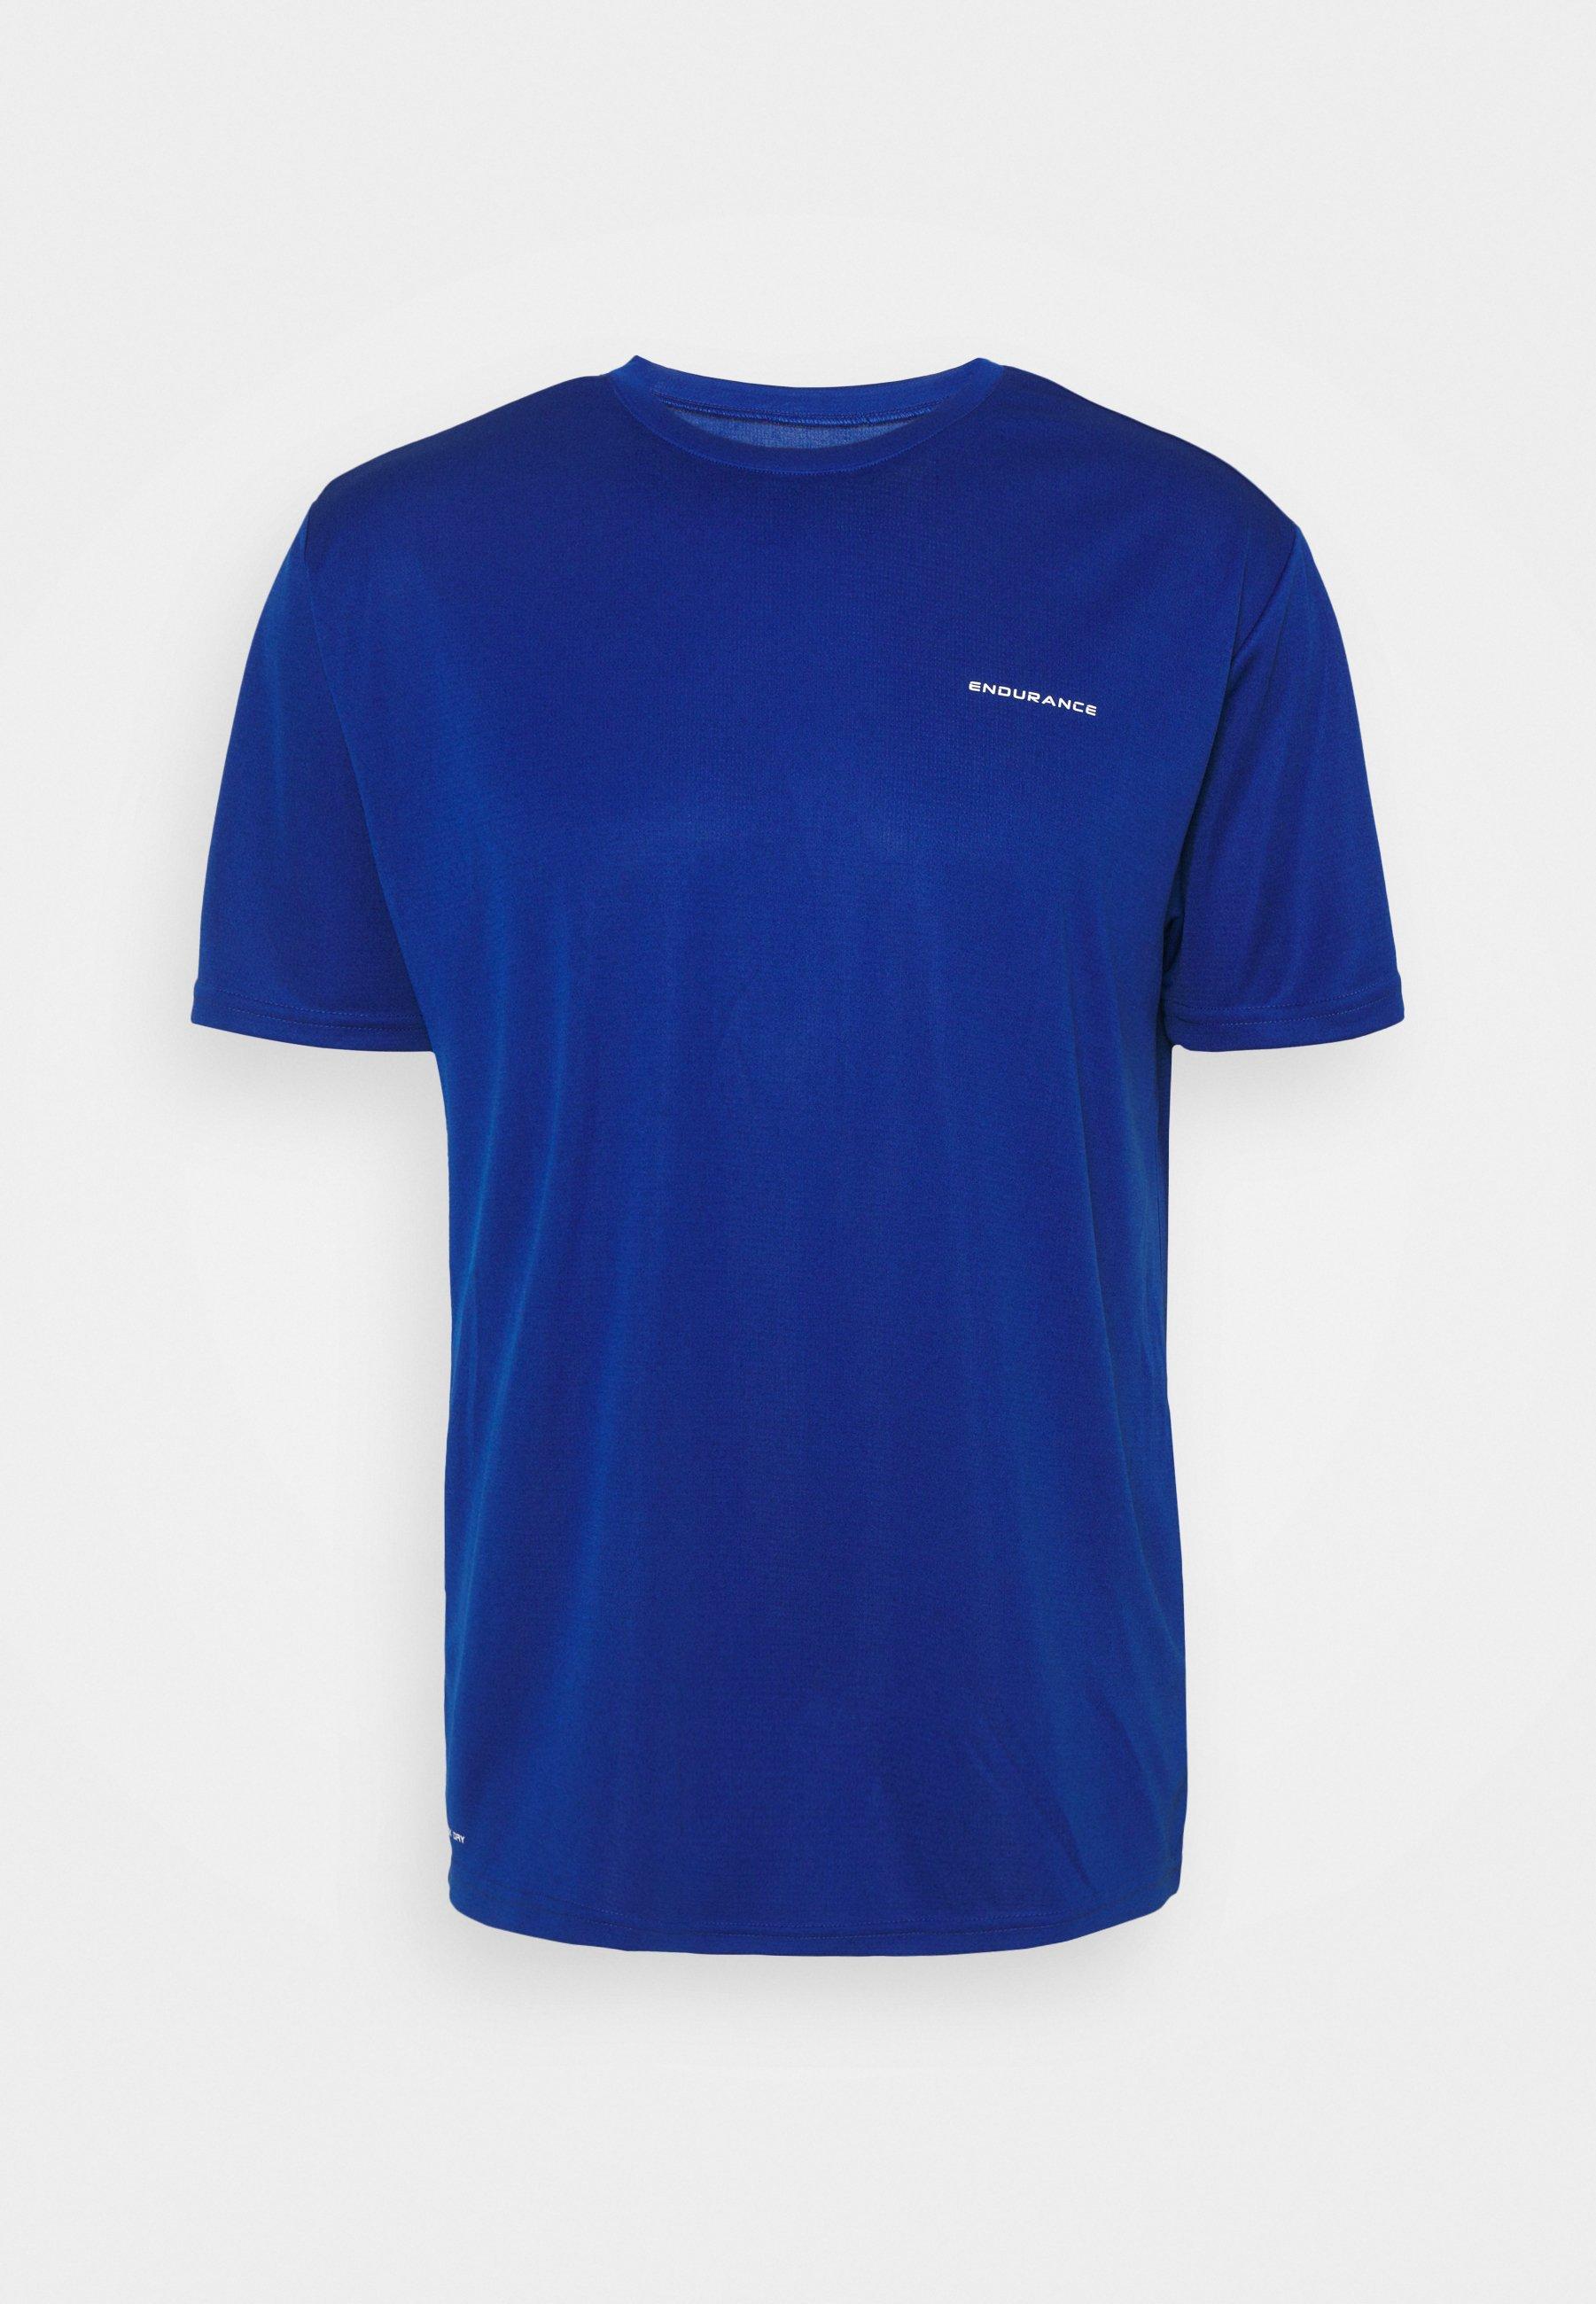 Homme VERNON PERFORMANCE TEE - T-shirt basique